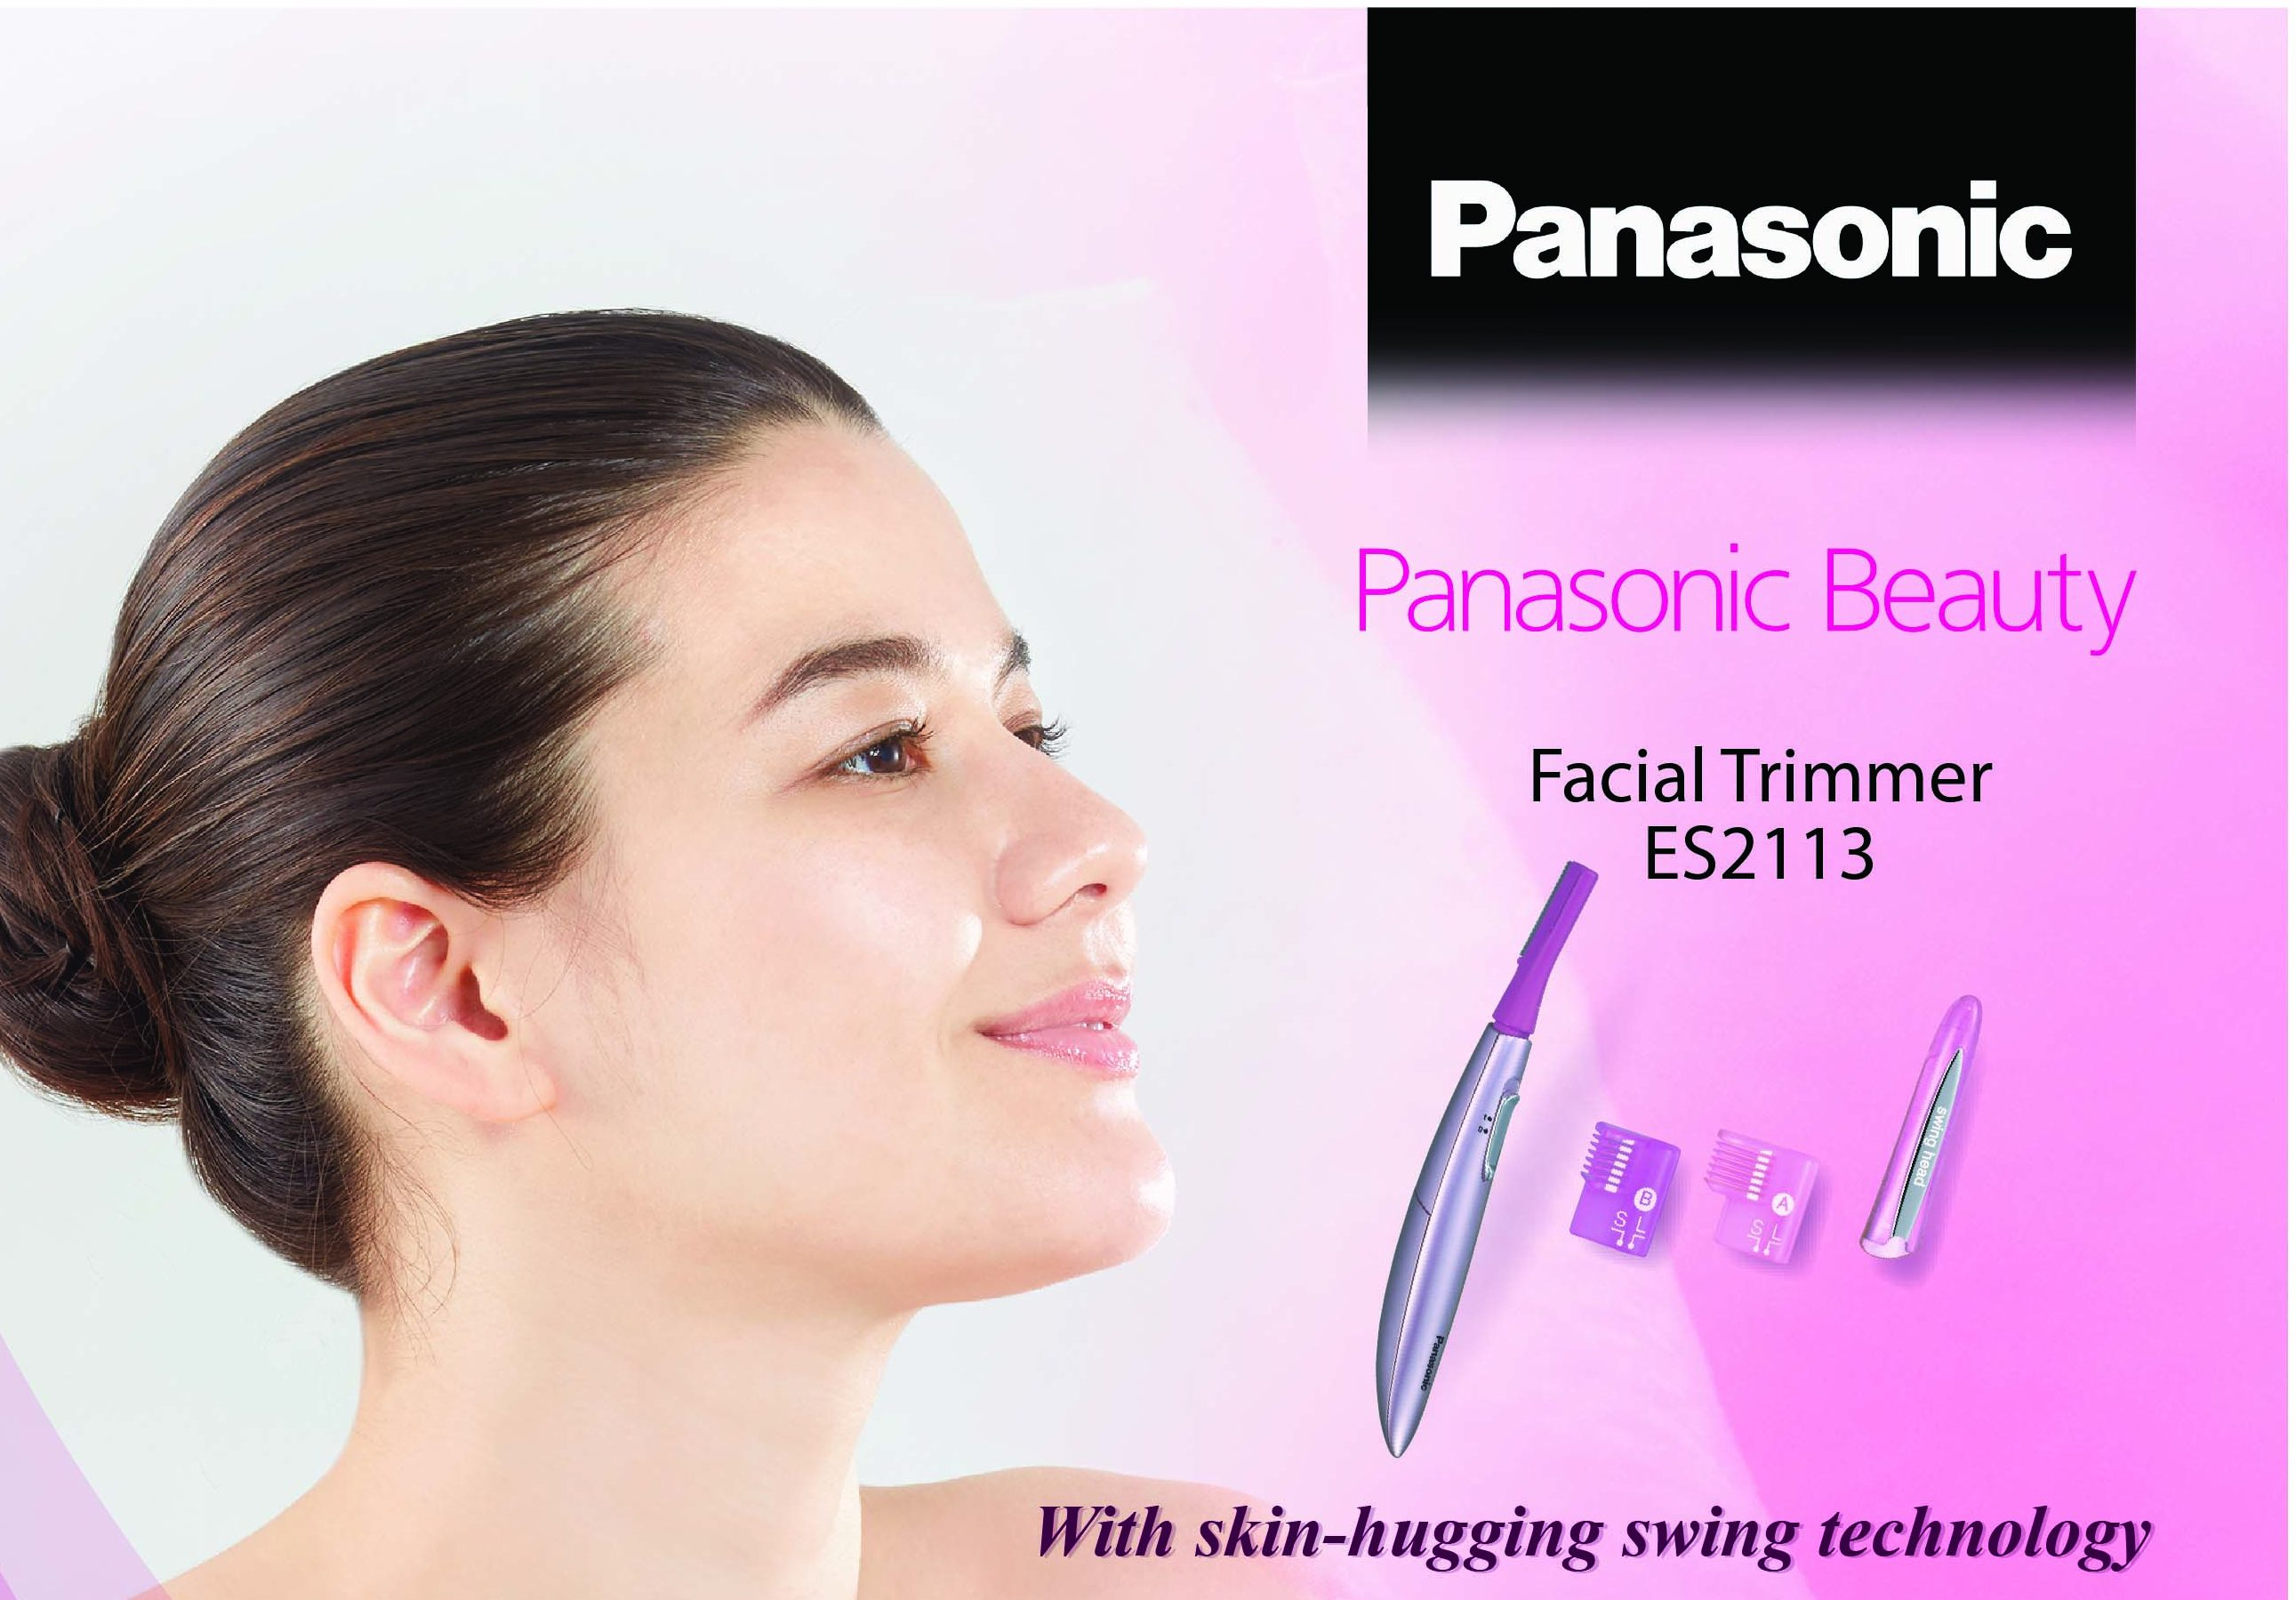 Manage And Contour Your Facial Hair With Panasonic Beauty Facial